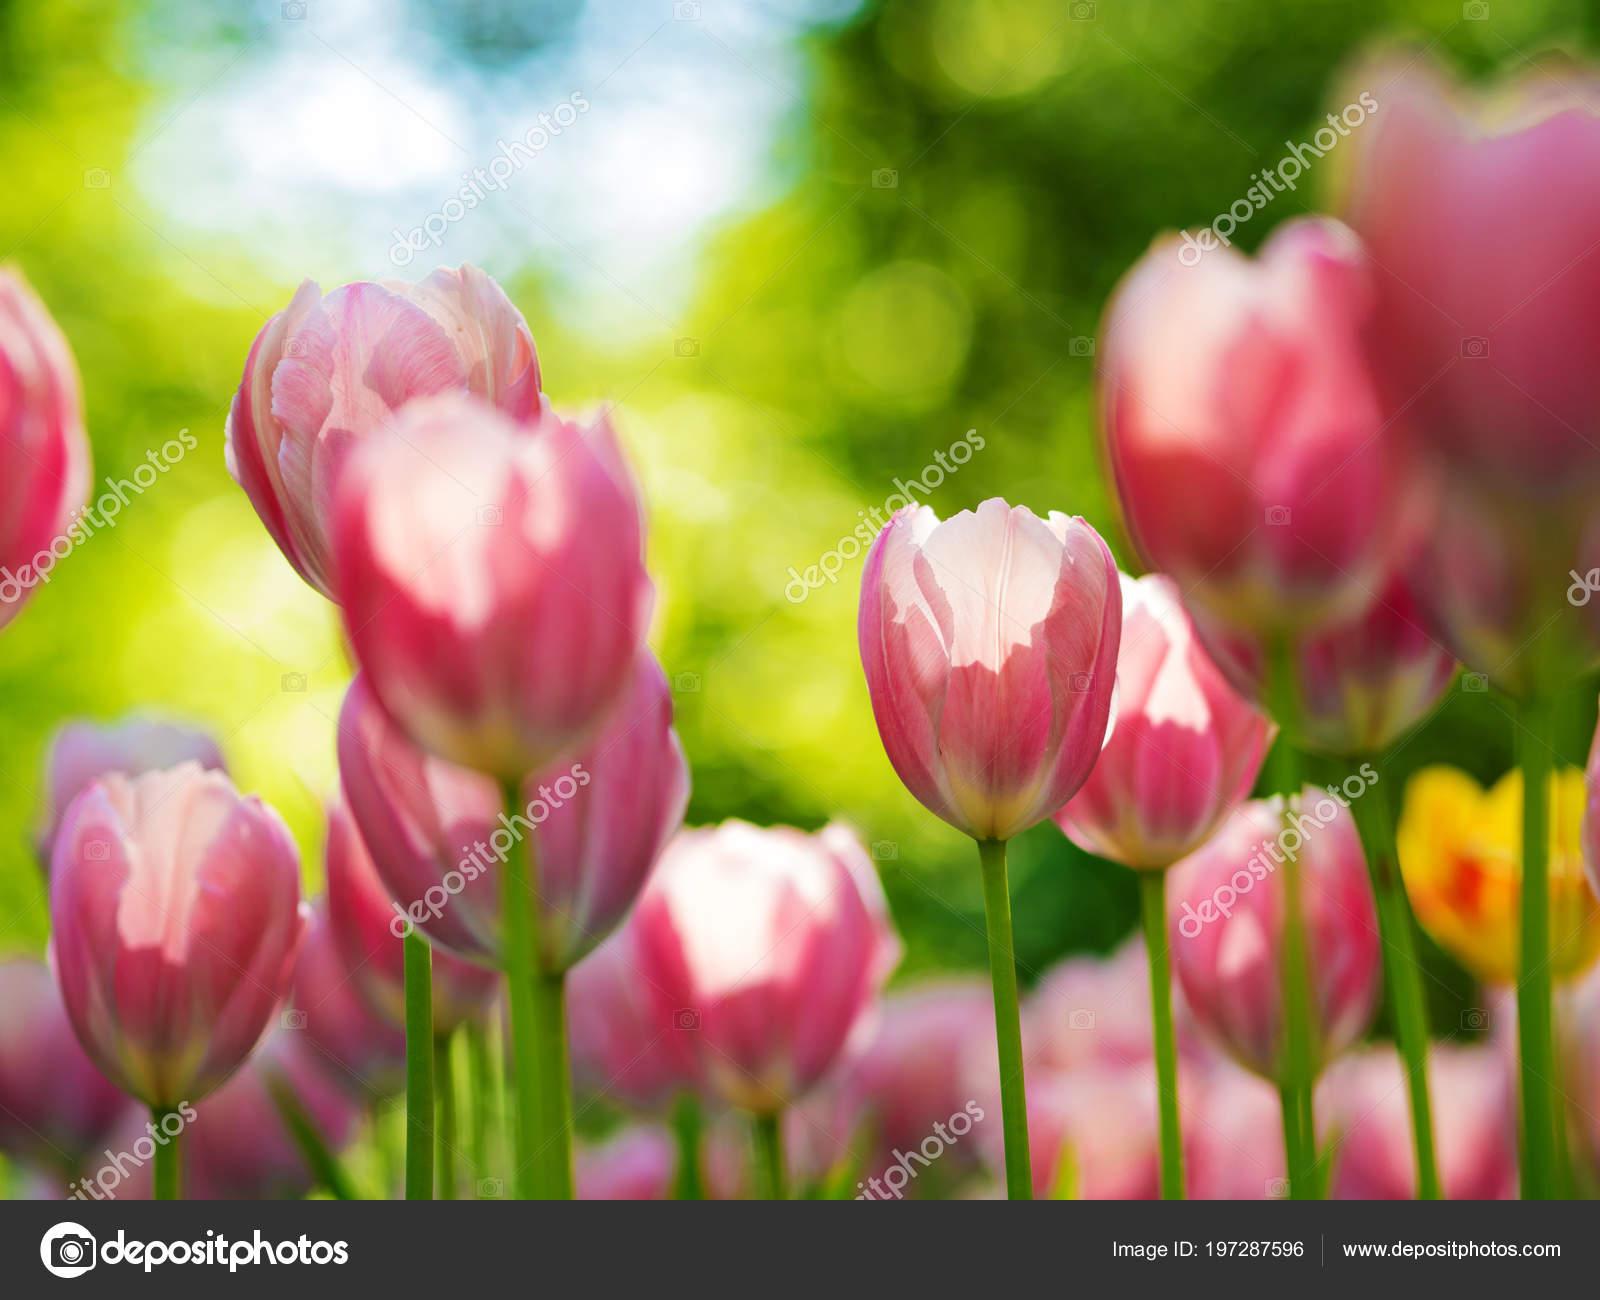 Tulipes roses. Plate-bande ou jardin avec différentes variétés de ...